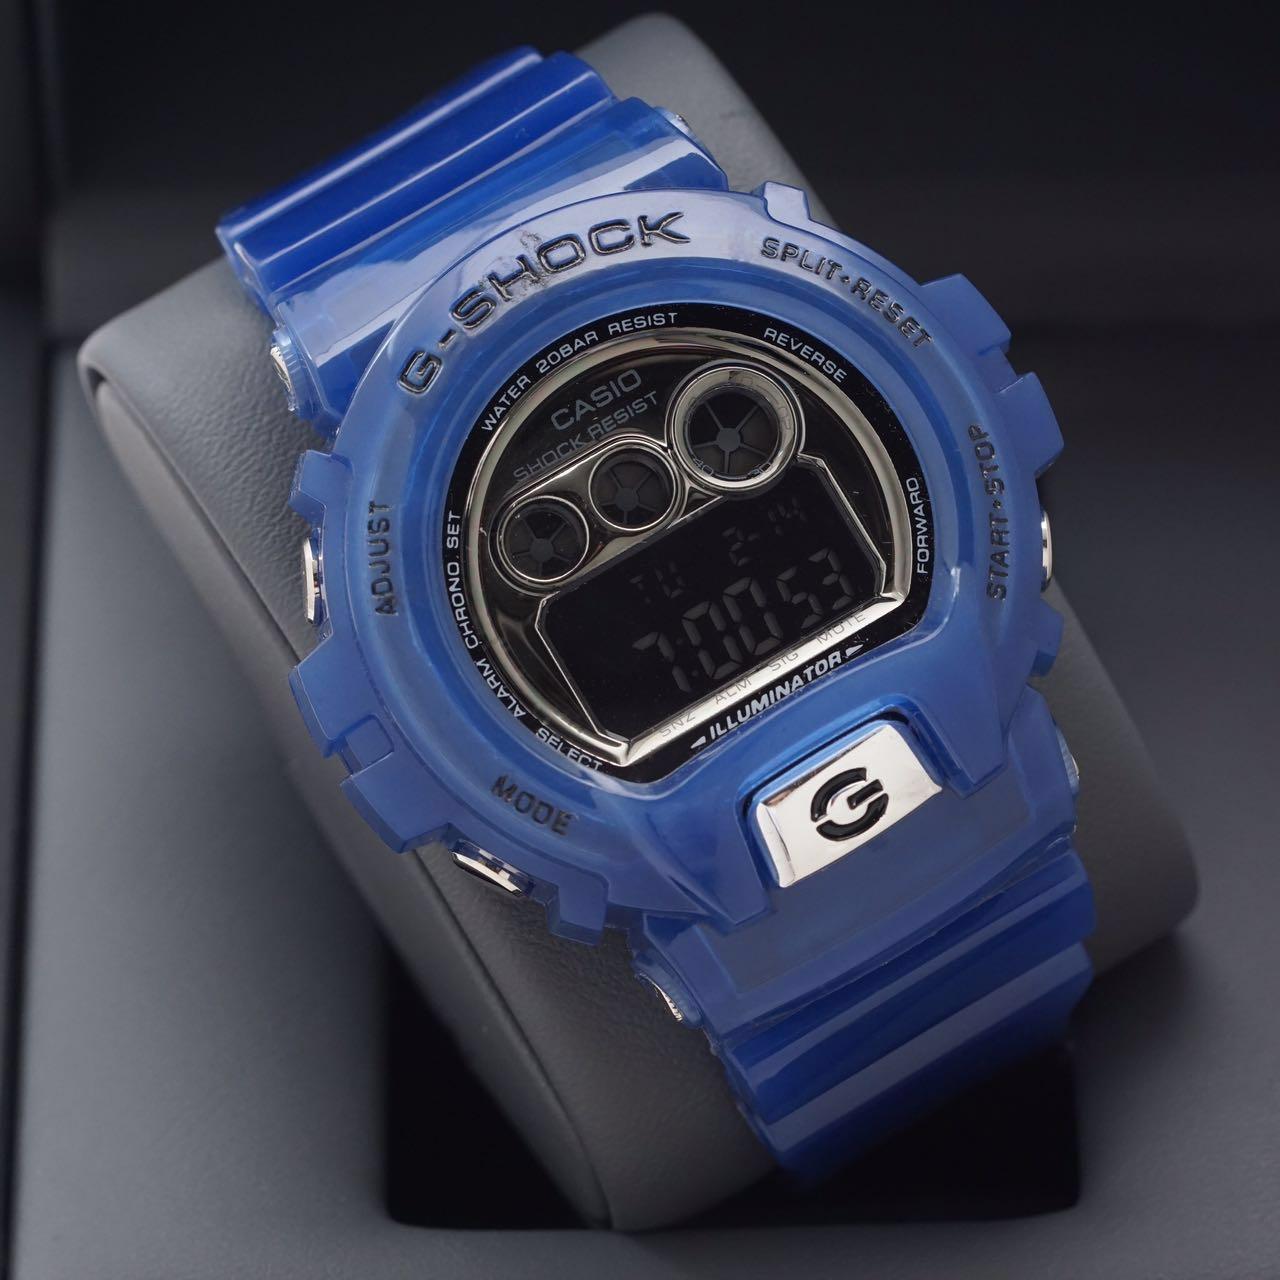 Jual Casio G Shock Dw 6900 Full Biru Gshock Dw6900 Kw Super Jam Tangan Grosiran Tokopedia